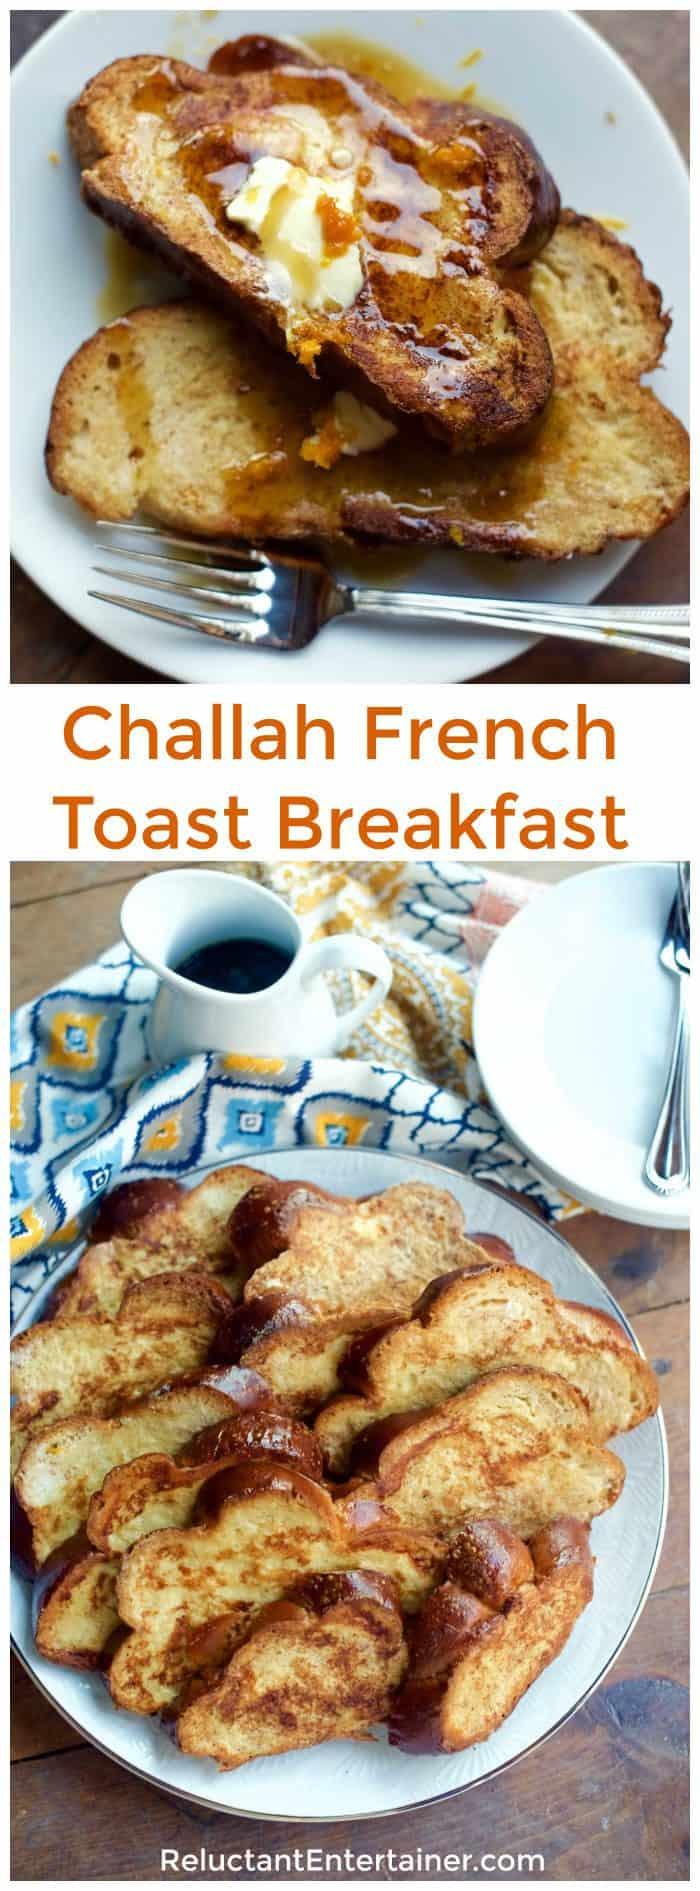 Challah French Toast Breakfast Recipe